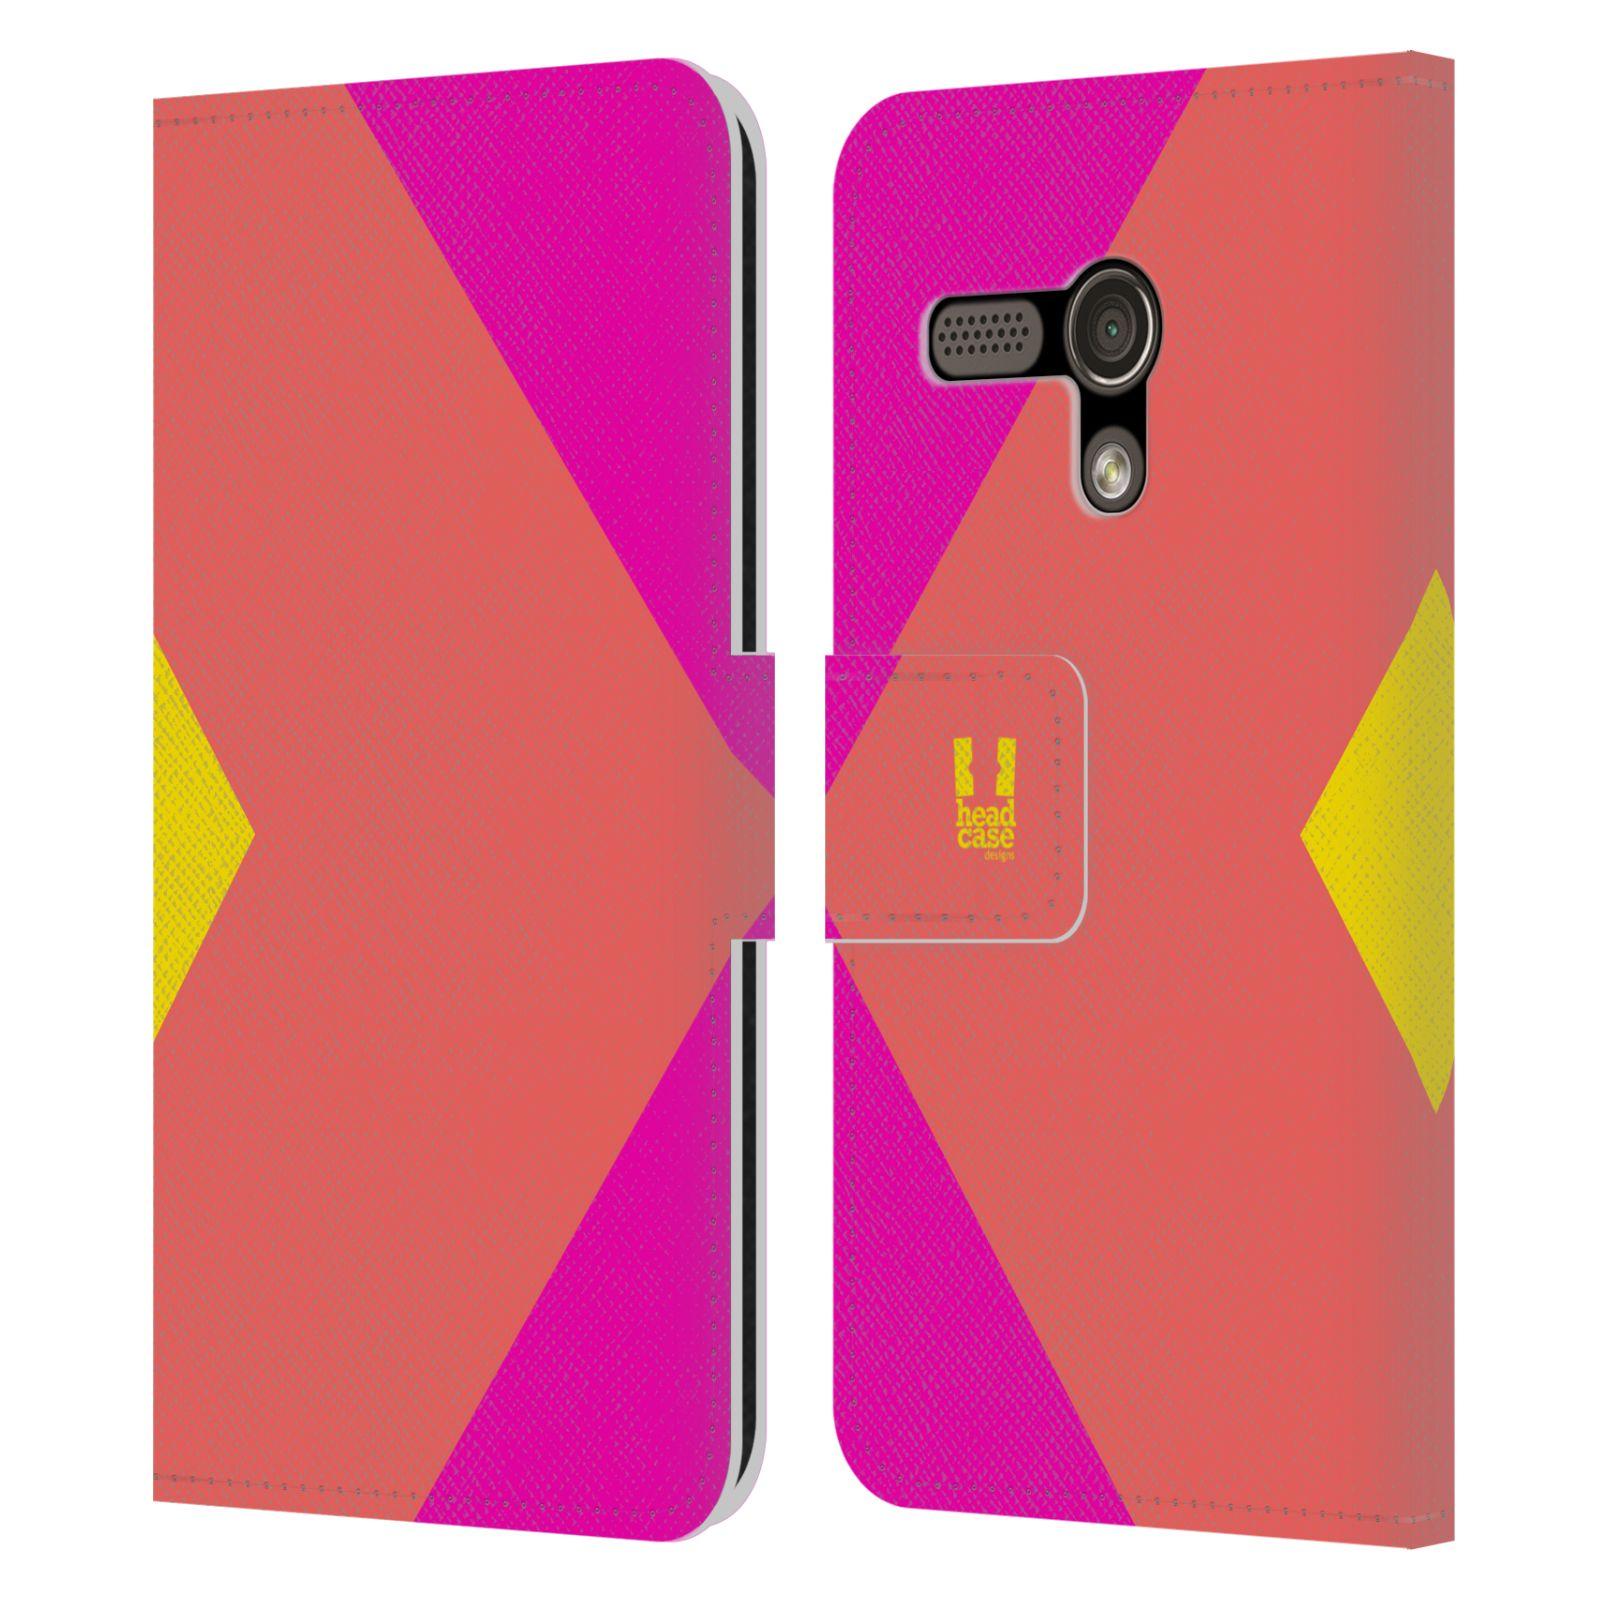 HEAD CASE Flipové pouzdro pro mobil Motorola MOTO G barevné tvary růžová korál